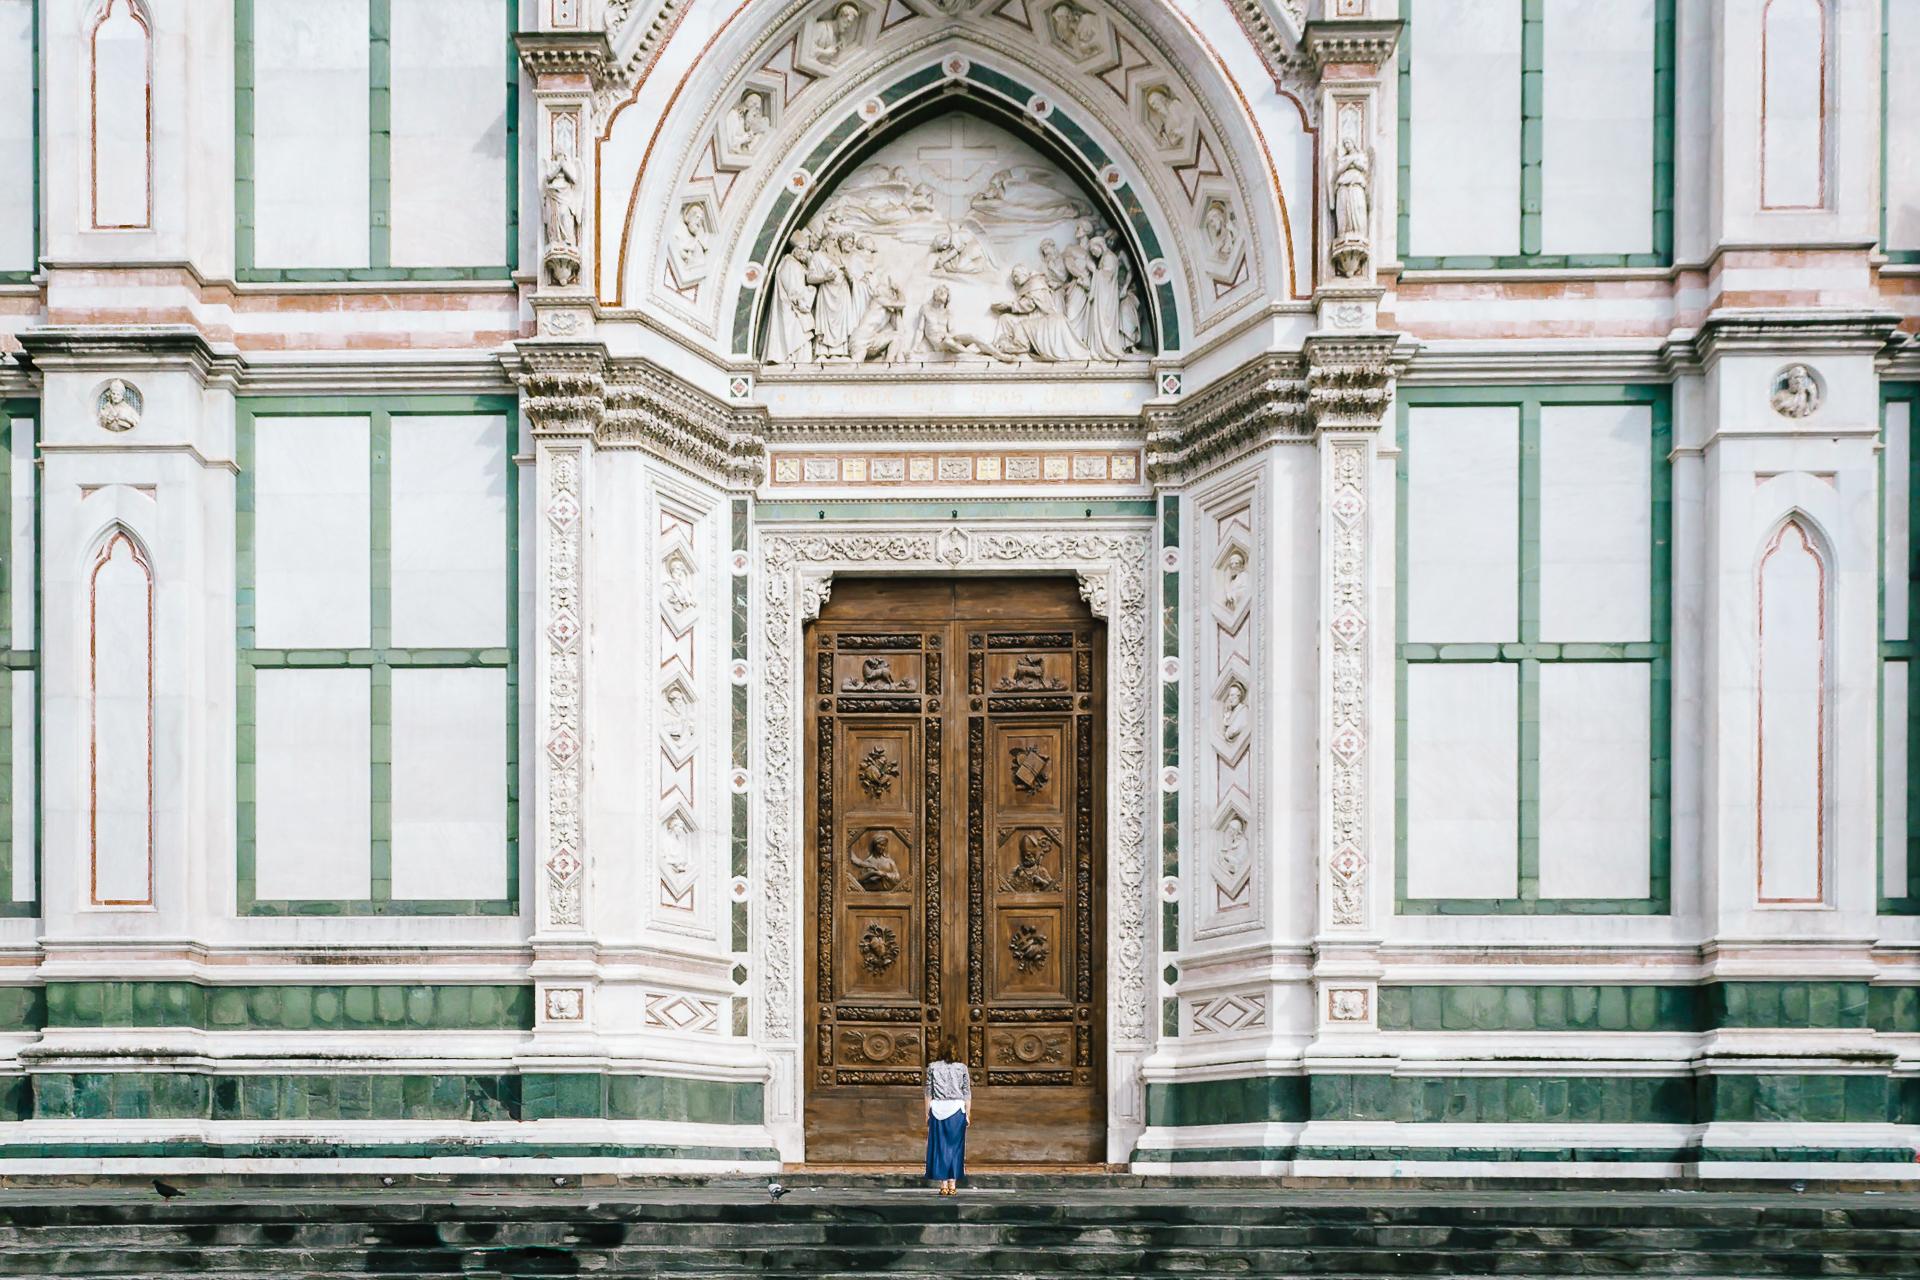 Santa Maria Novella, Piazzale Michelangelo, Firenze, Florance, Toscana, Tuscany